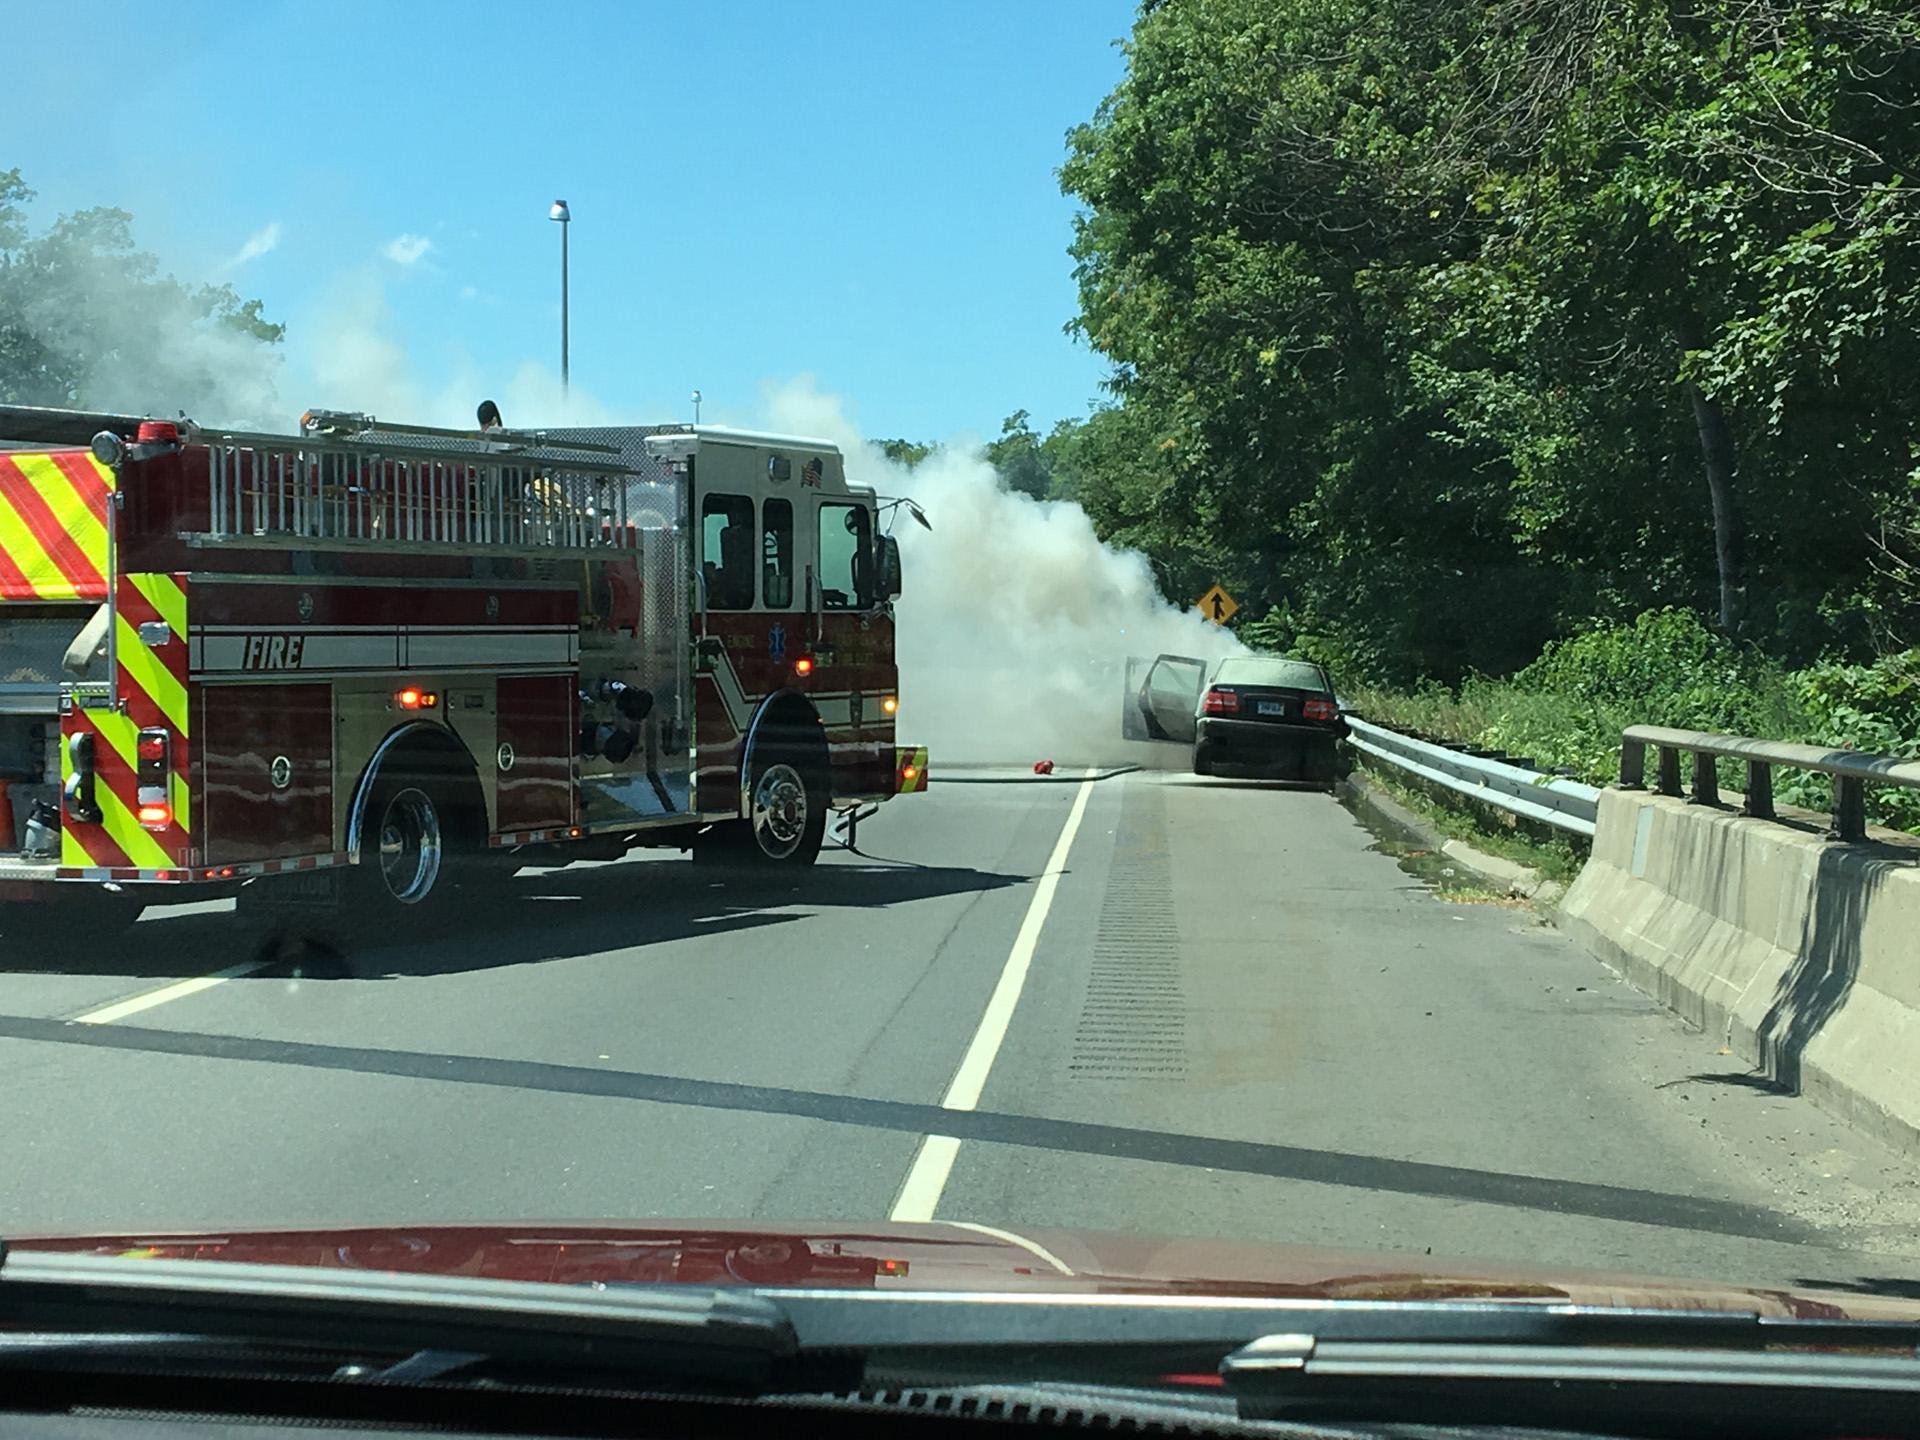 7_18_18 Woman saved from burning vehicle.JPG